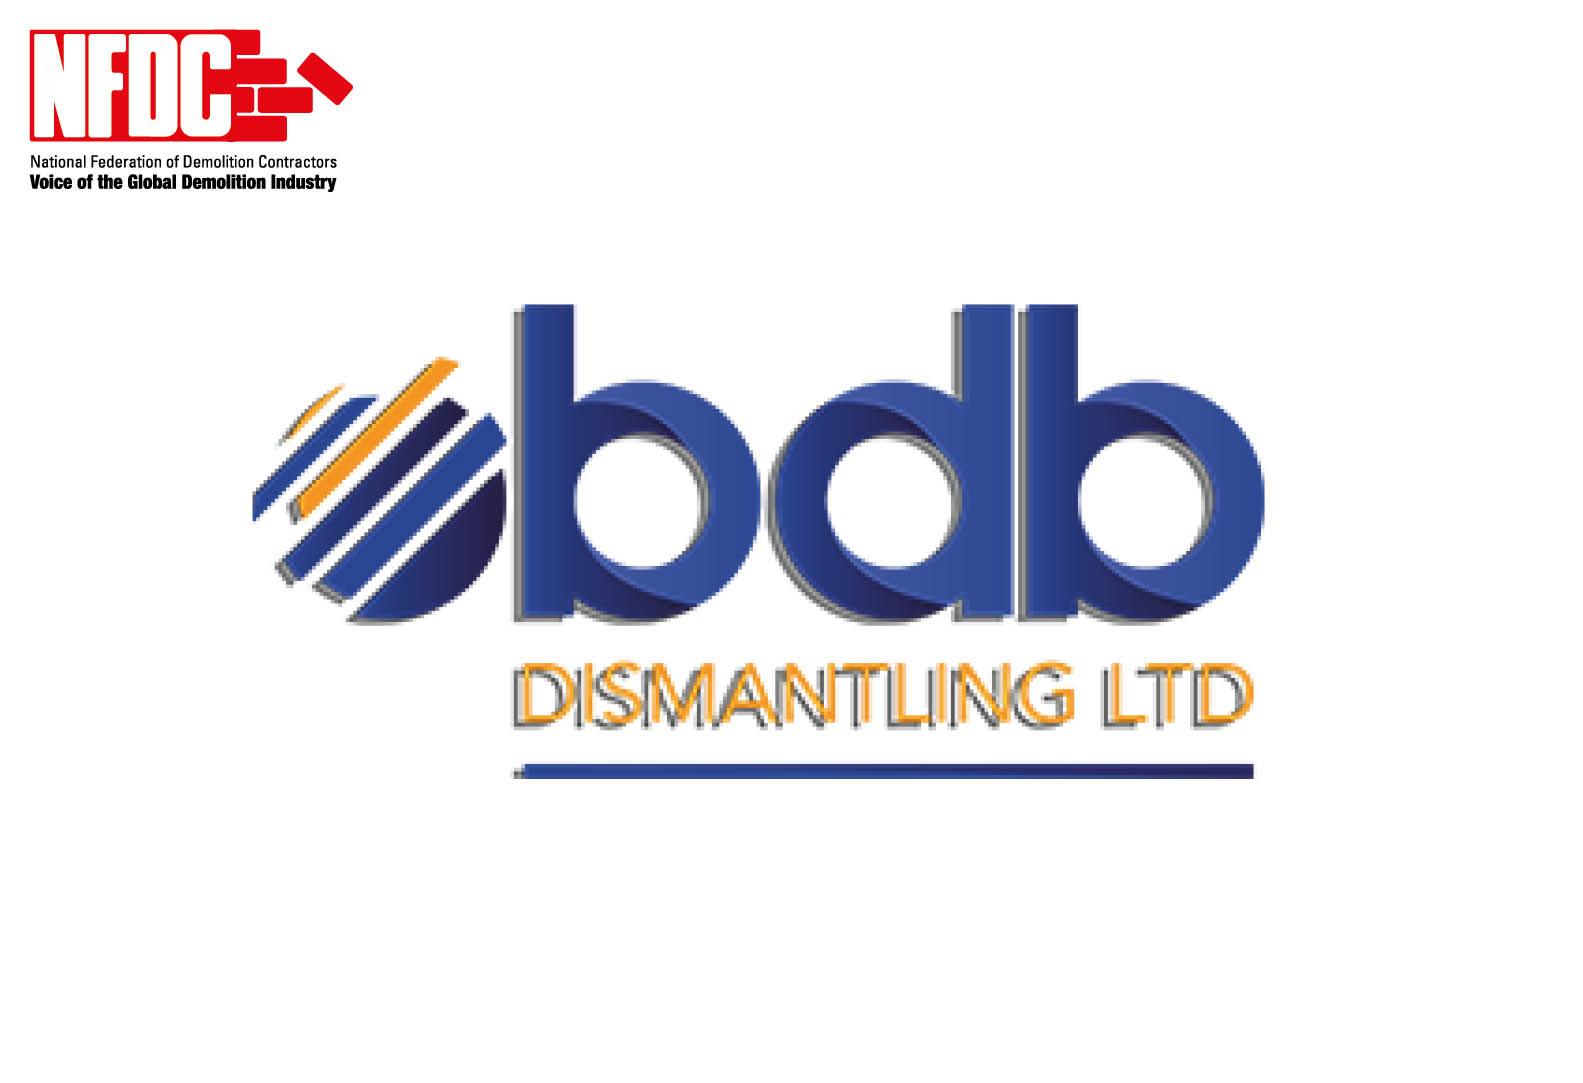 BDB Dismantling